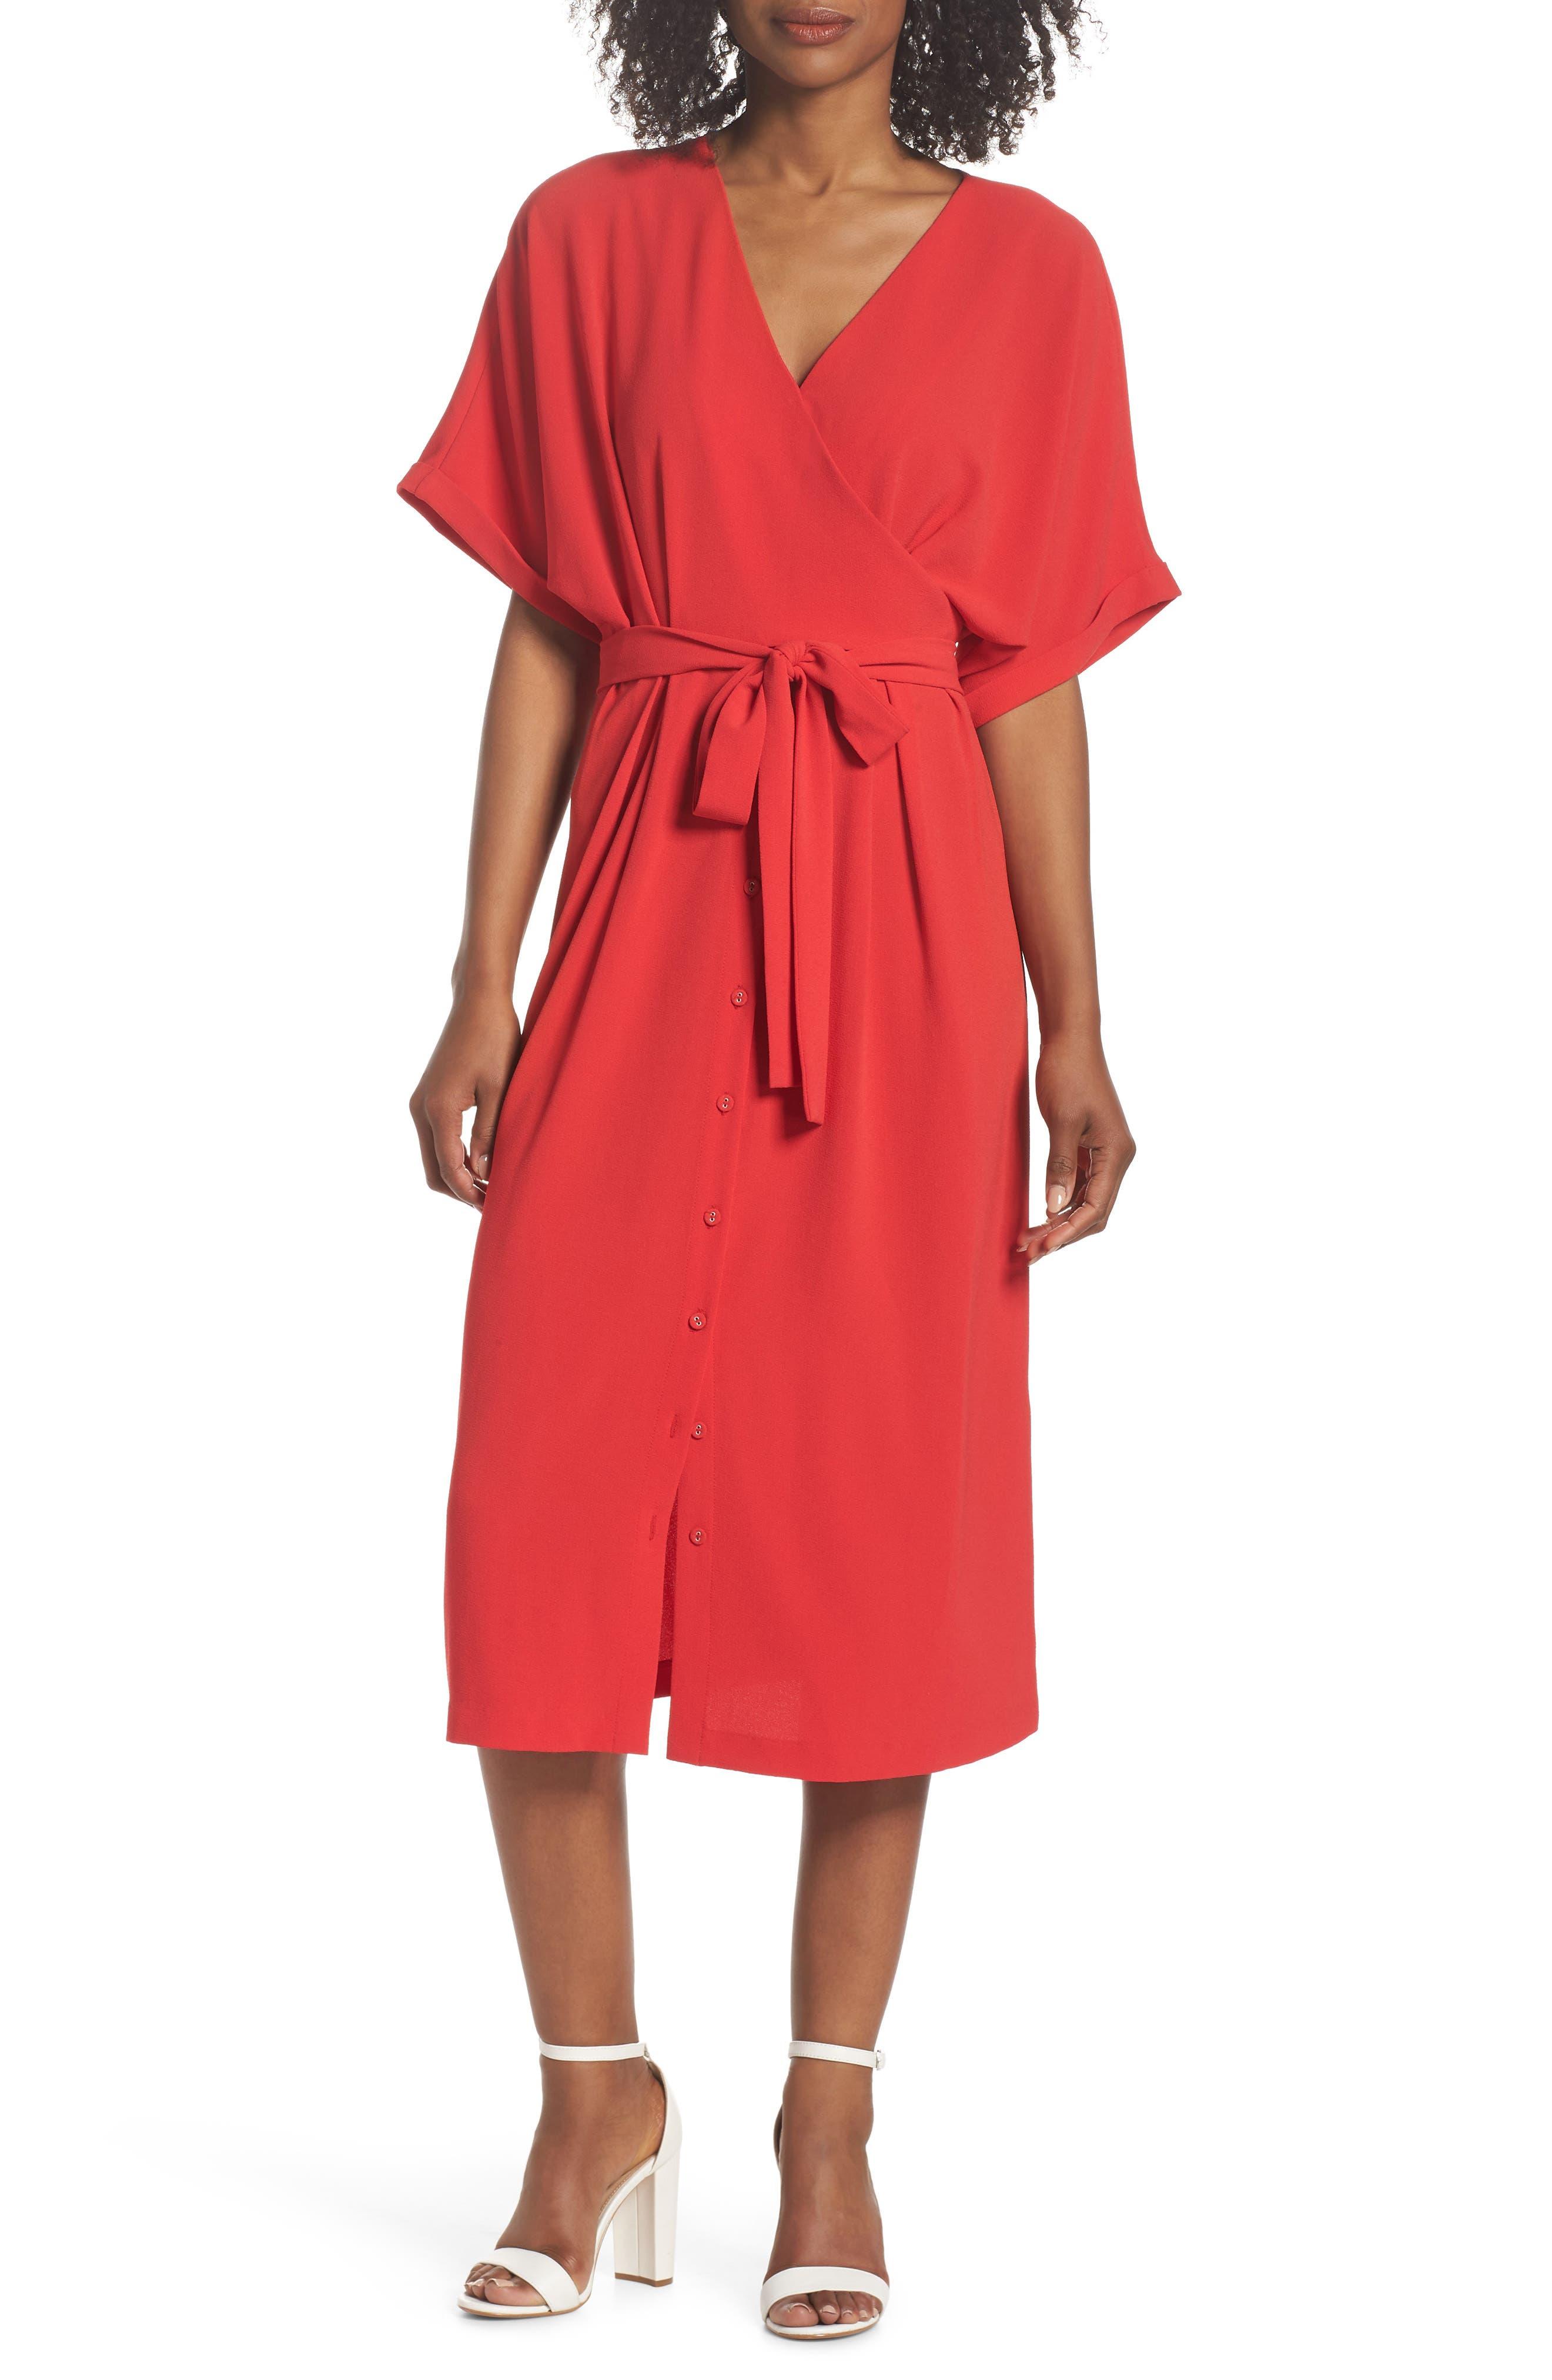 Felicity & Coco Dolman Sleeve Faux Wrap Dress